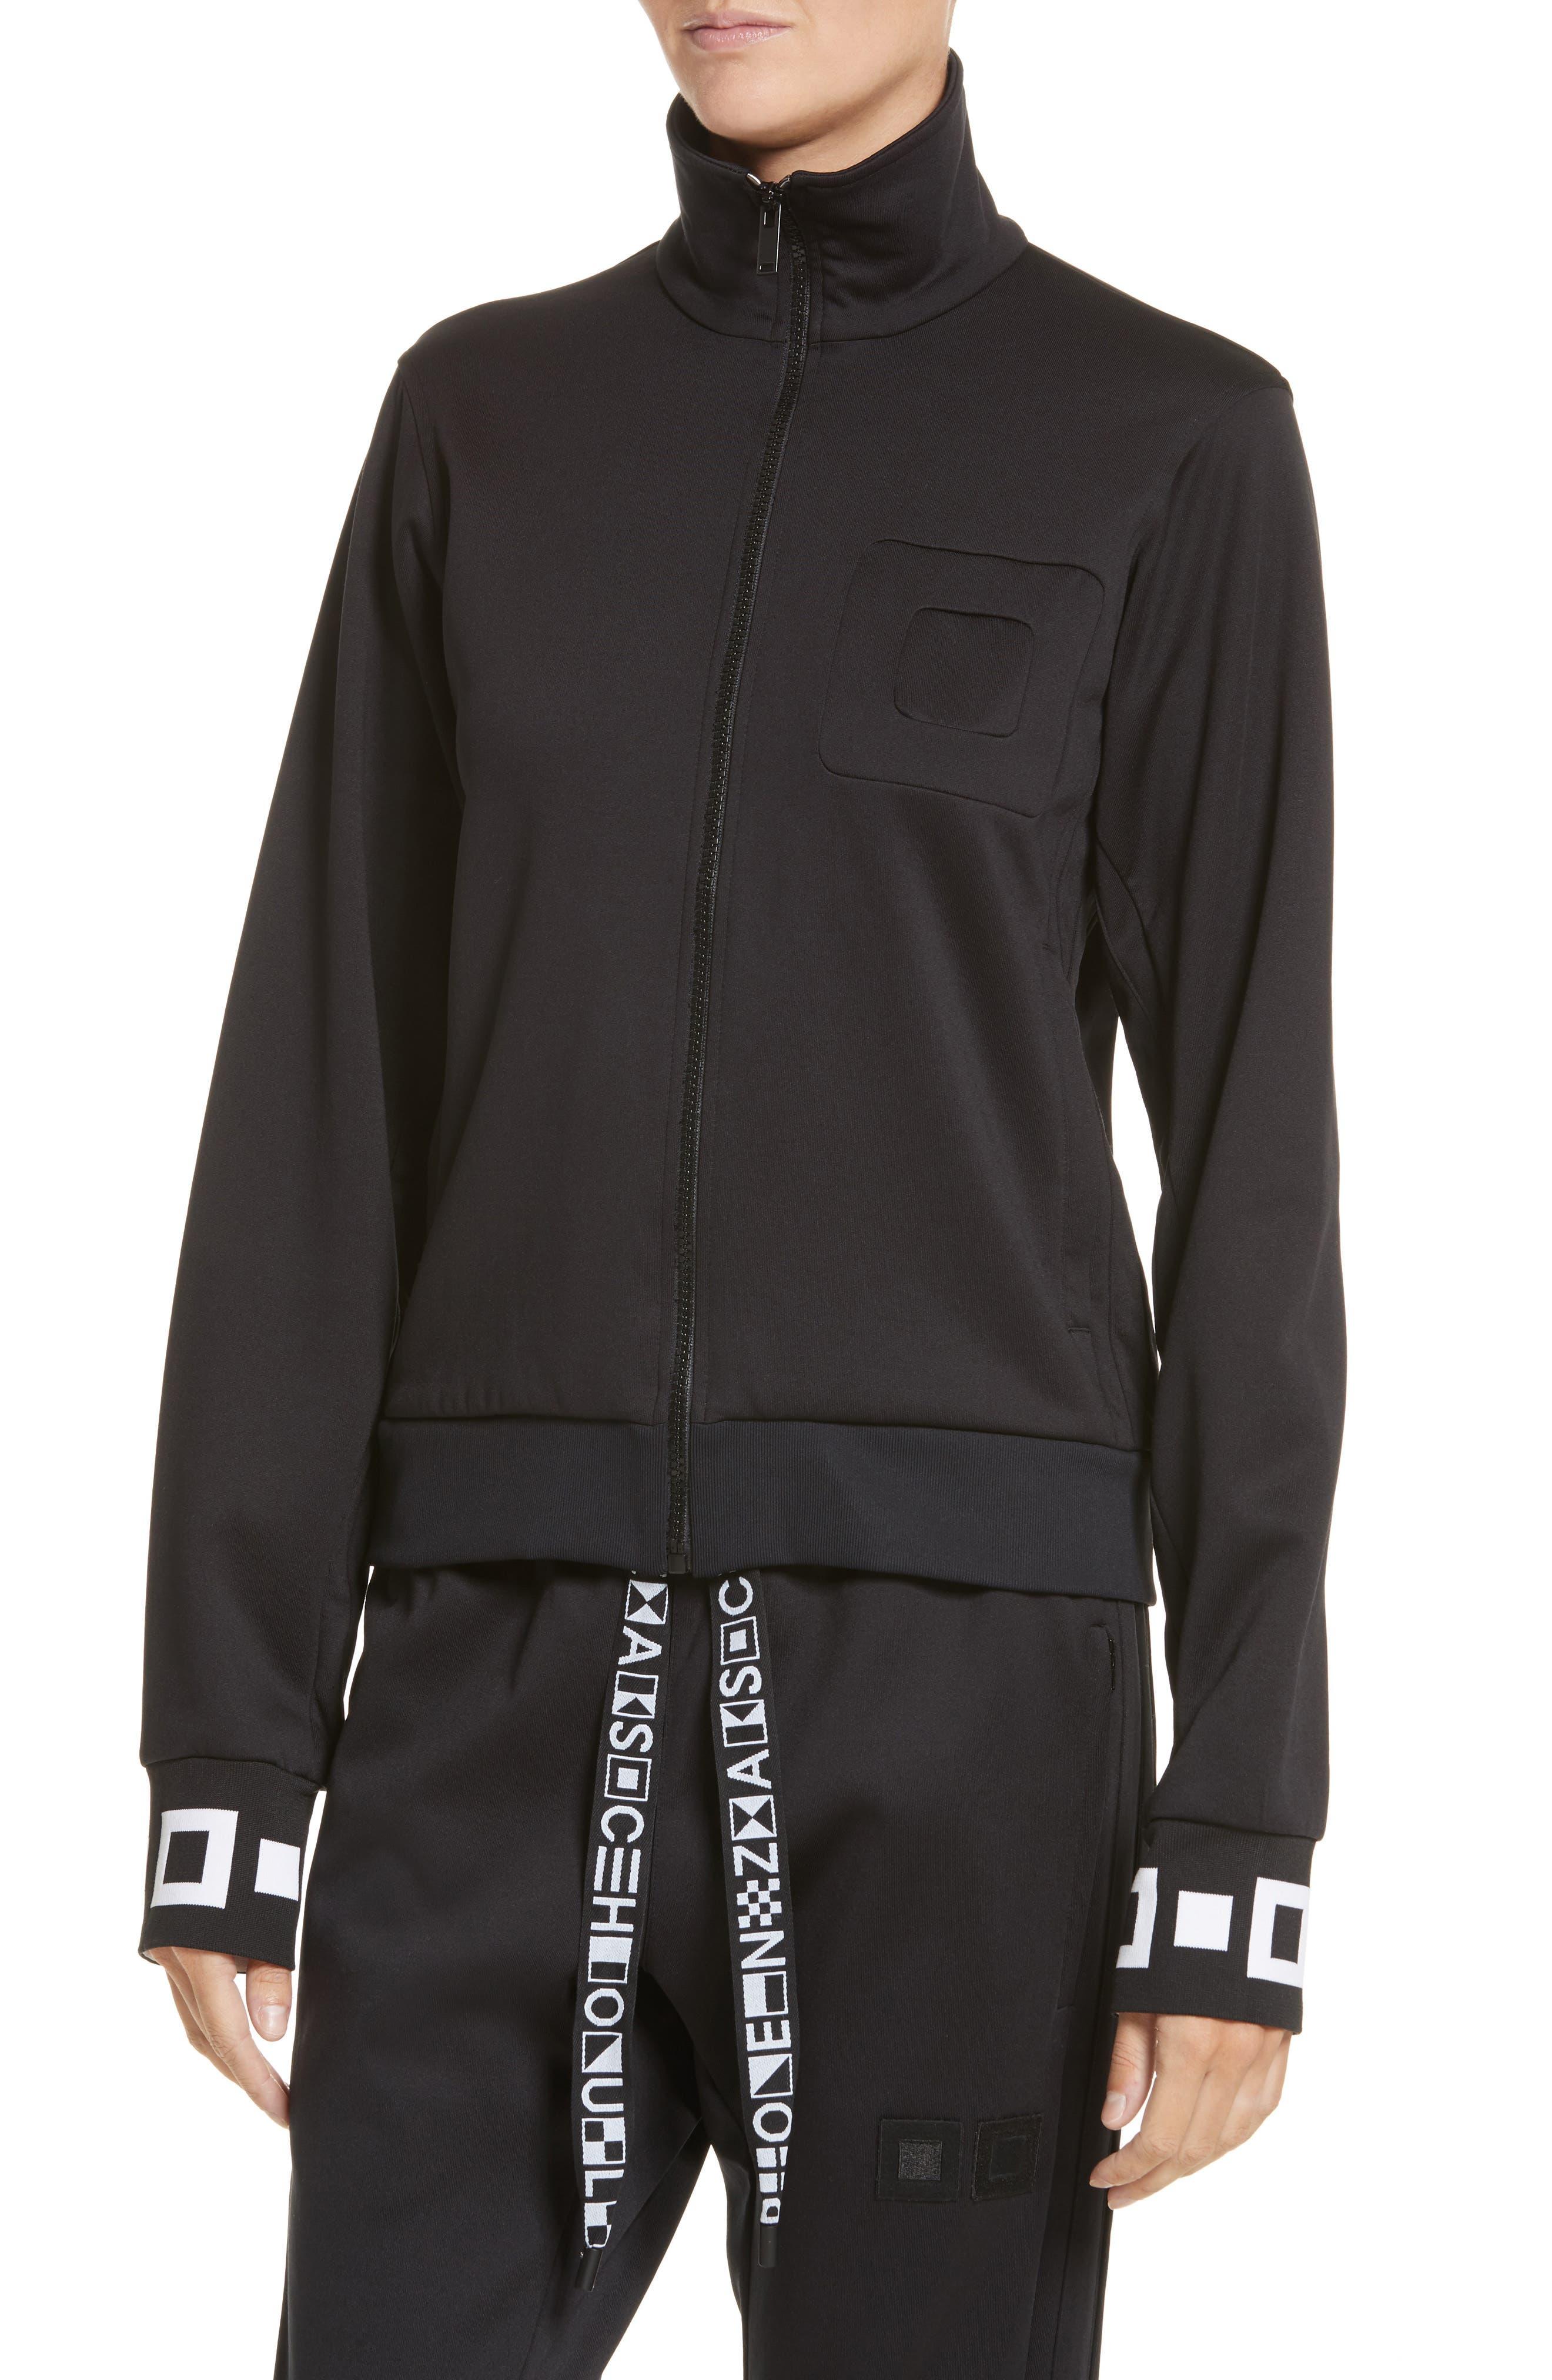 PSWL Jersey Track Jacket,                             Alternate thumbnail 4, color,                             001